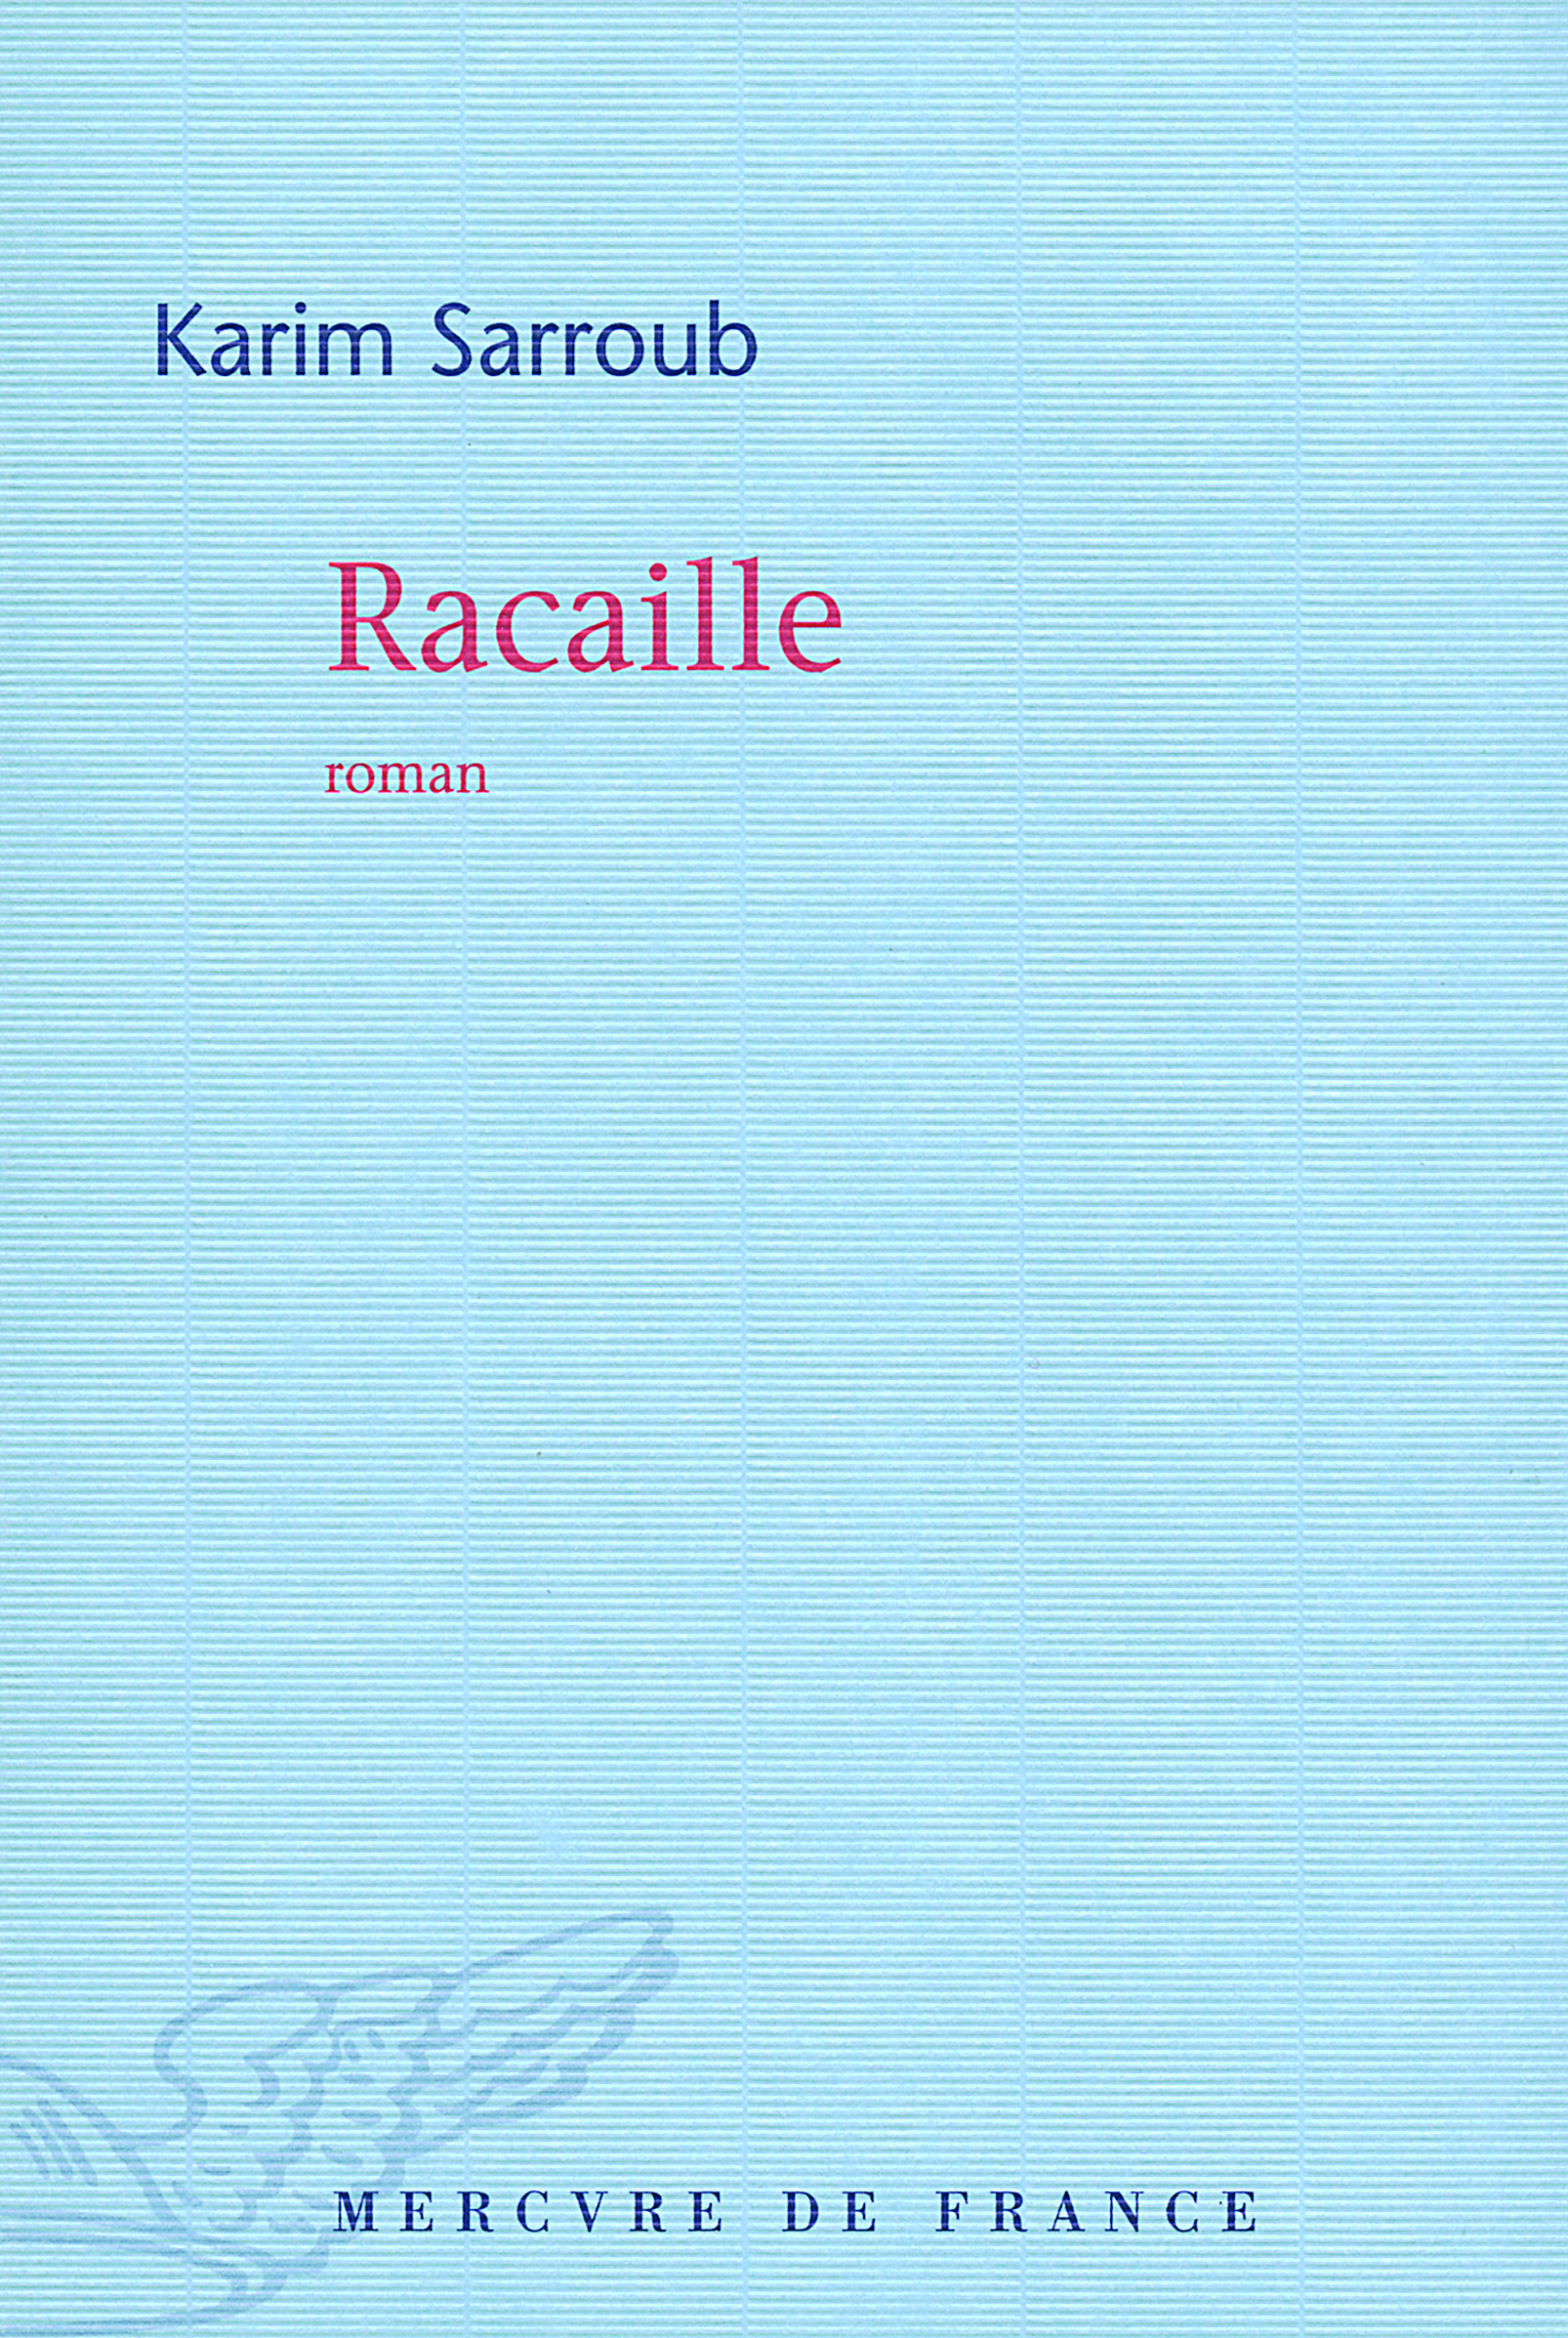 RACAILLE ROMAN